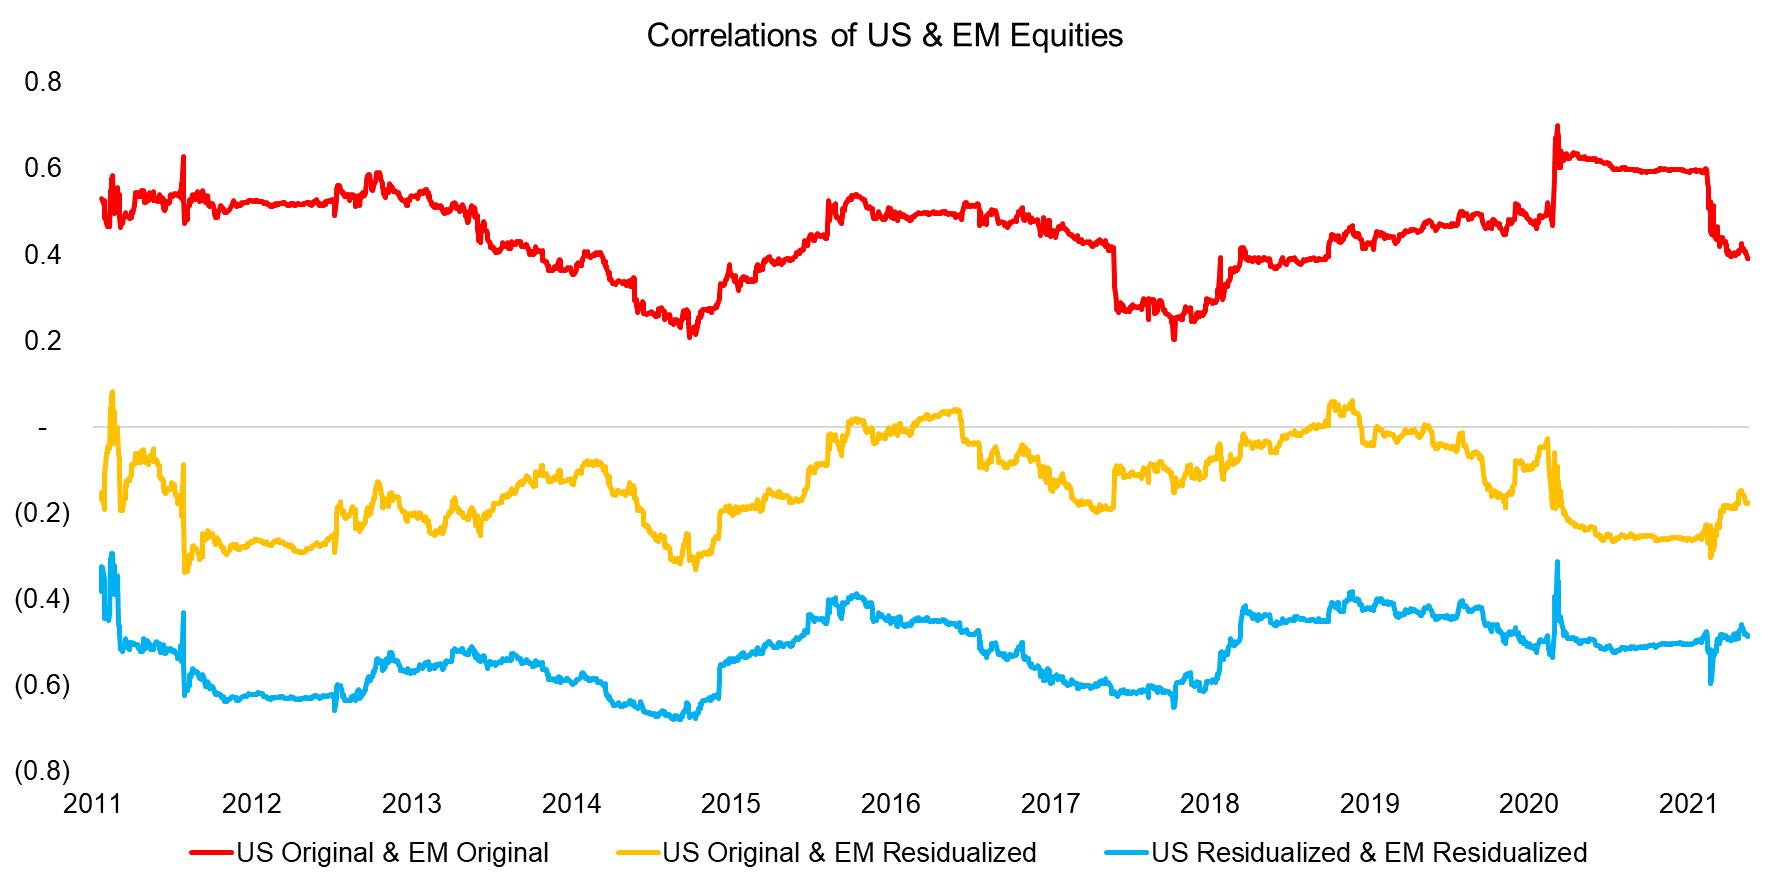 Correlations of US & EM Equities